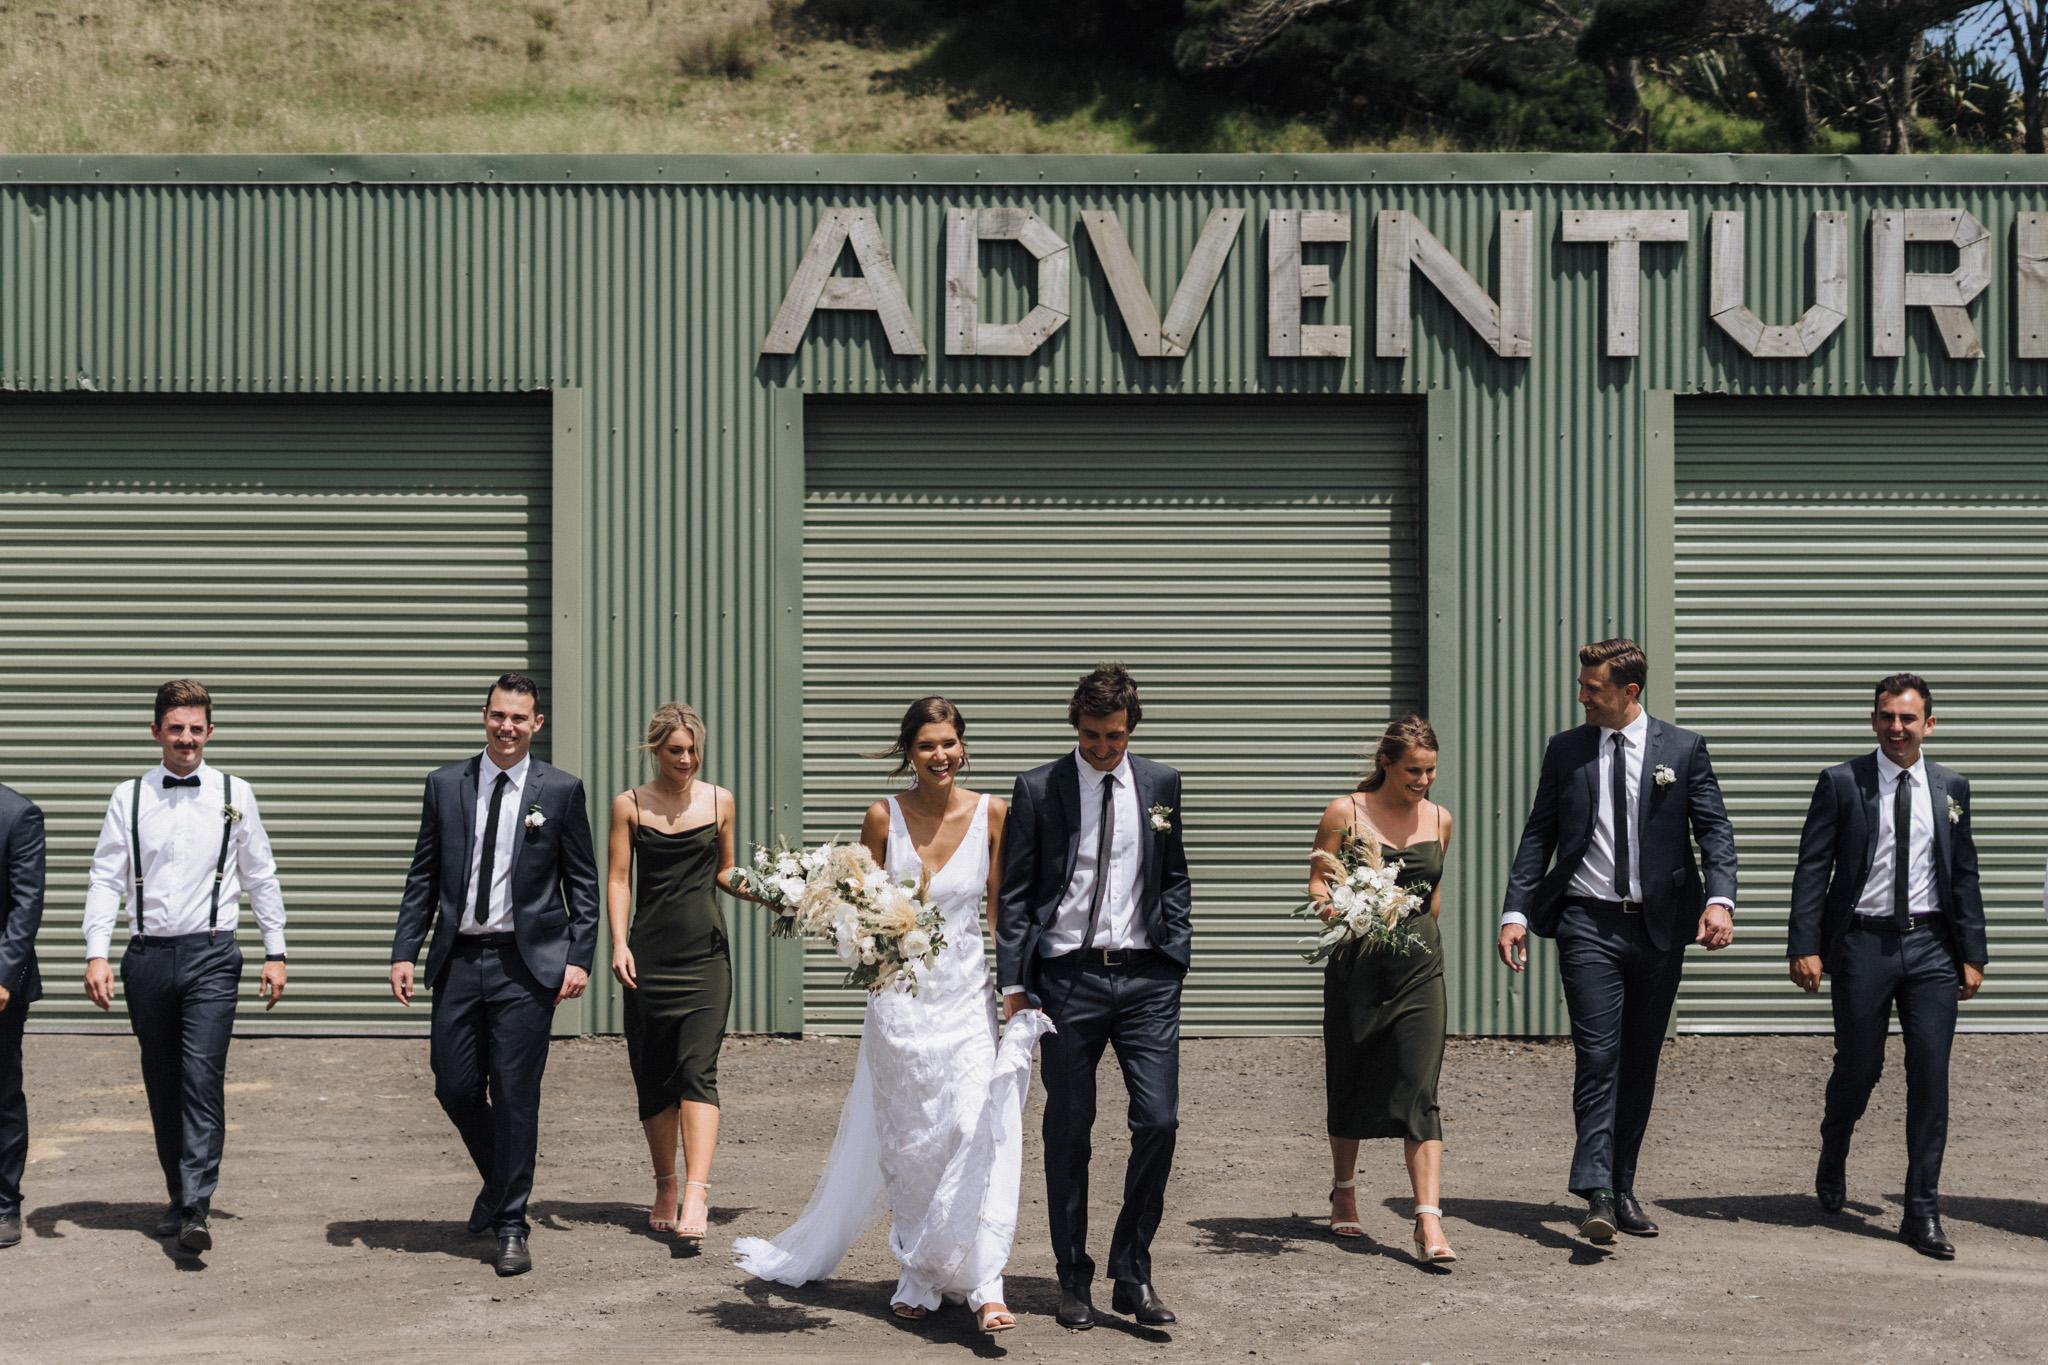 newfound-h-m-castaways-waiuku-auckland-wedding-photographer-68